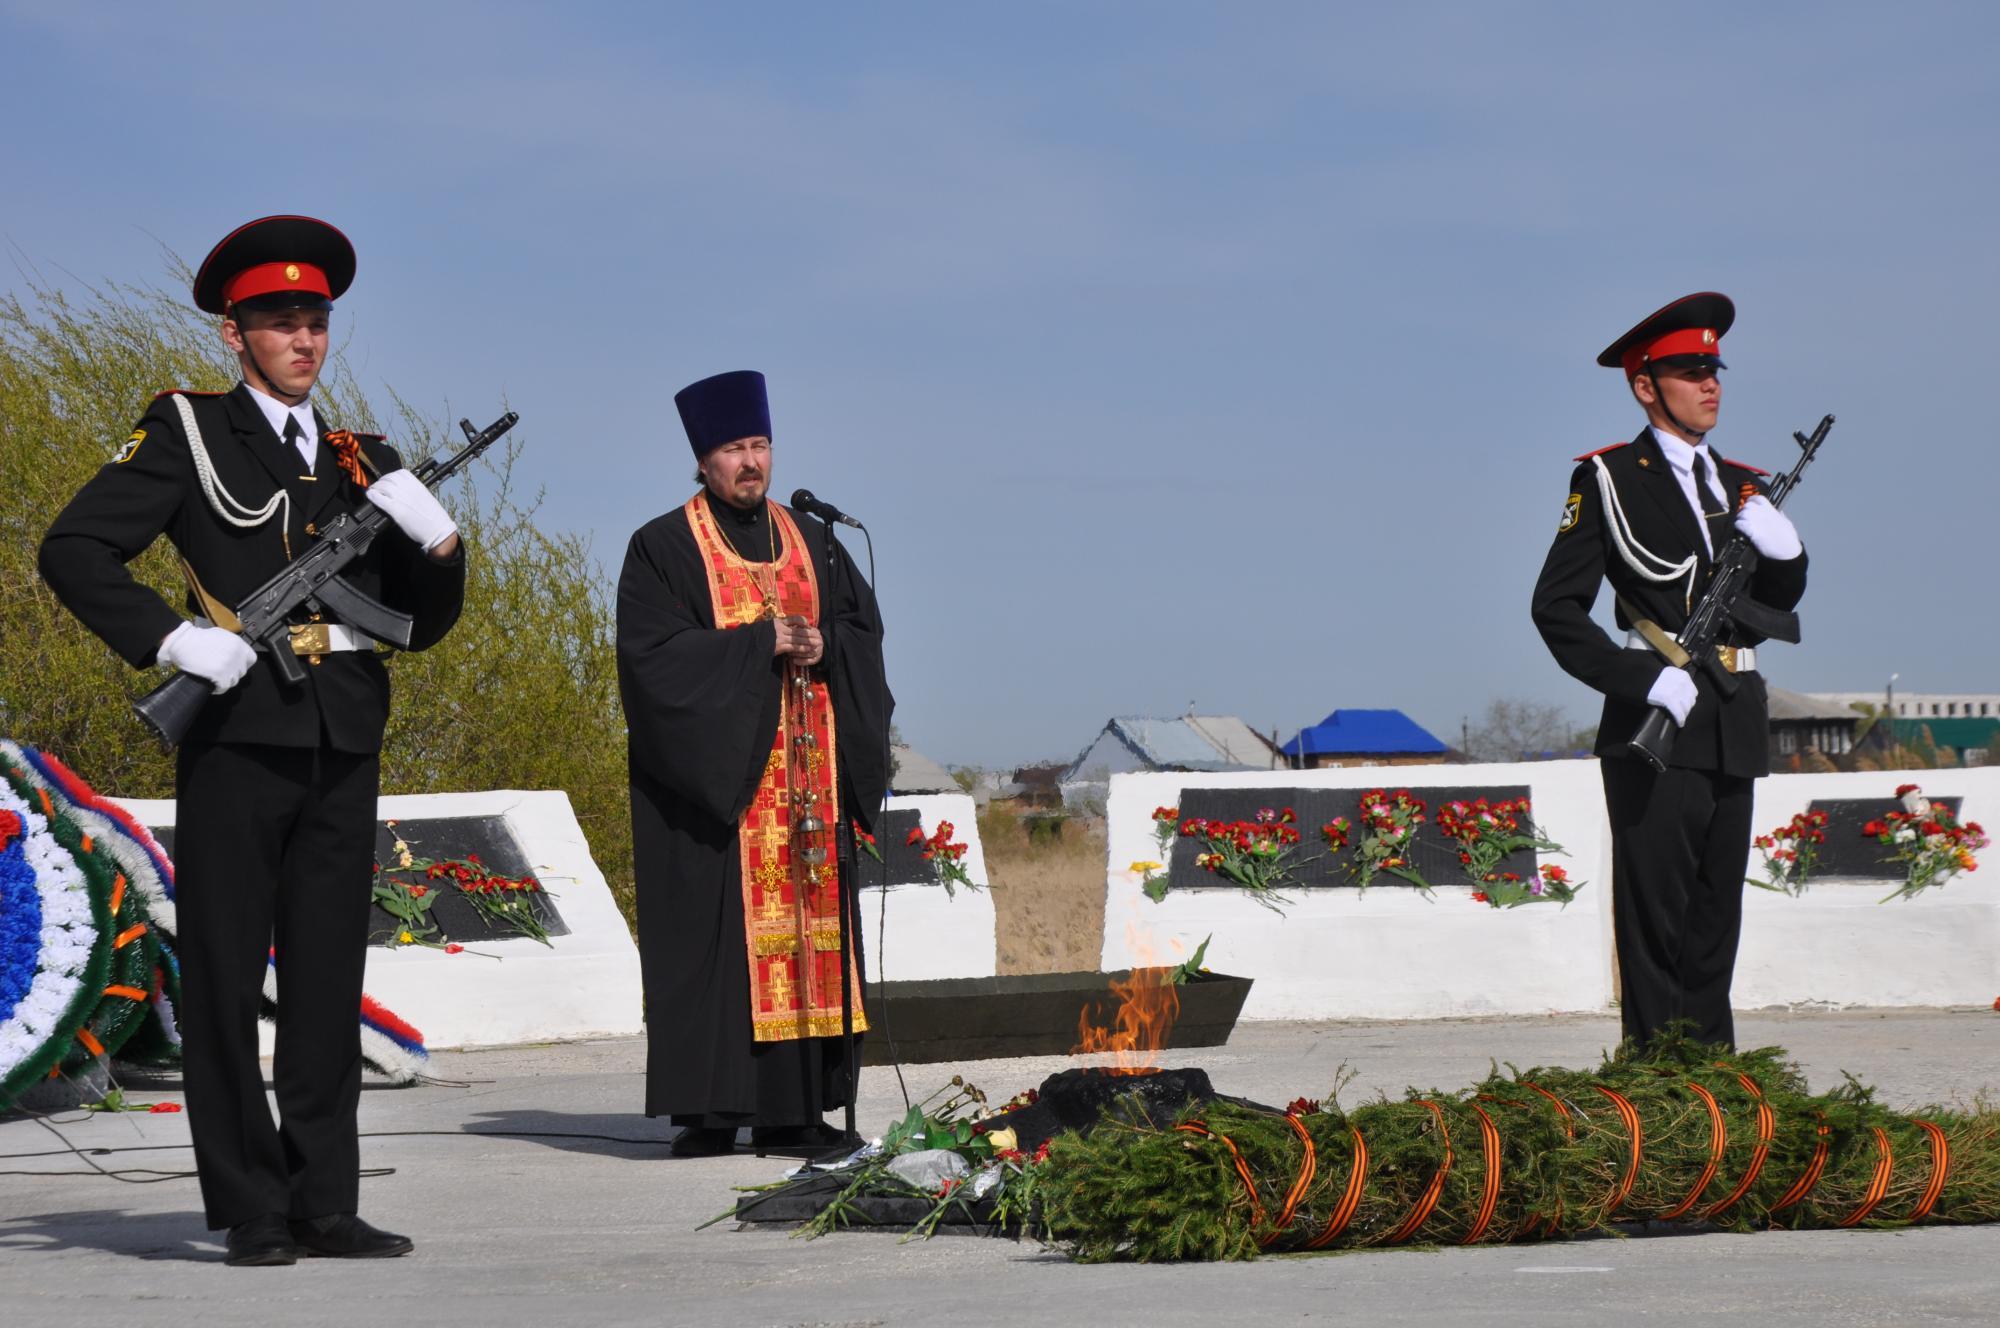 кокорин губернатор курганской области биография